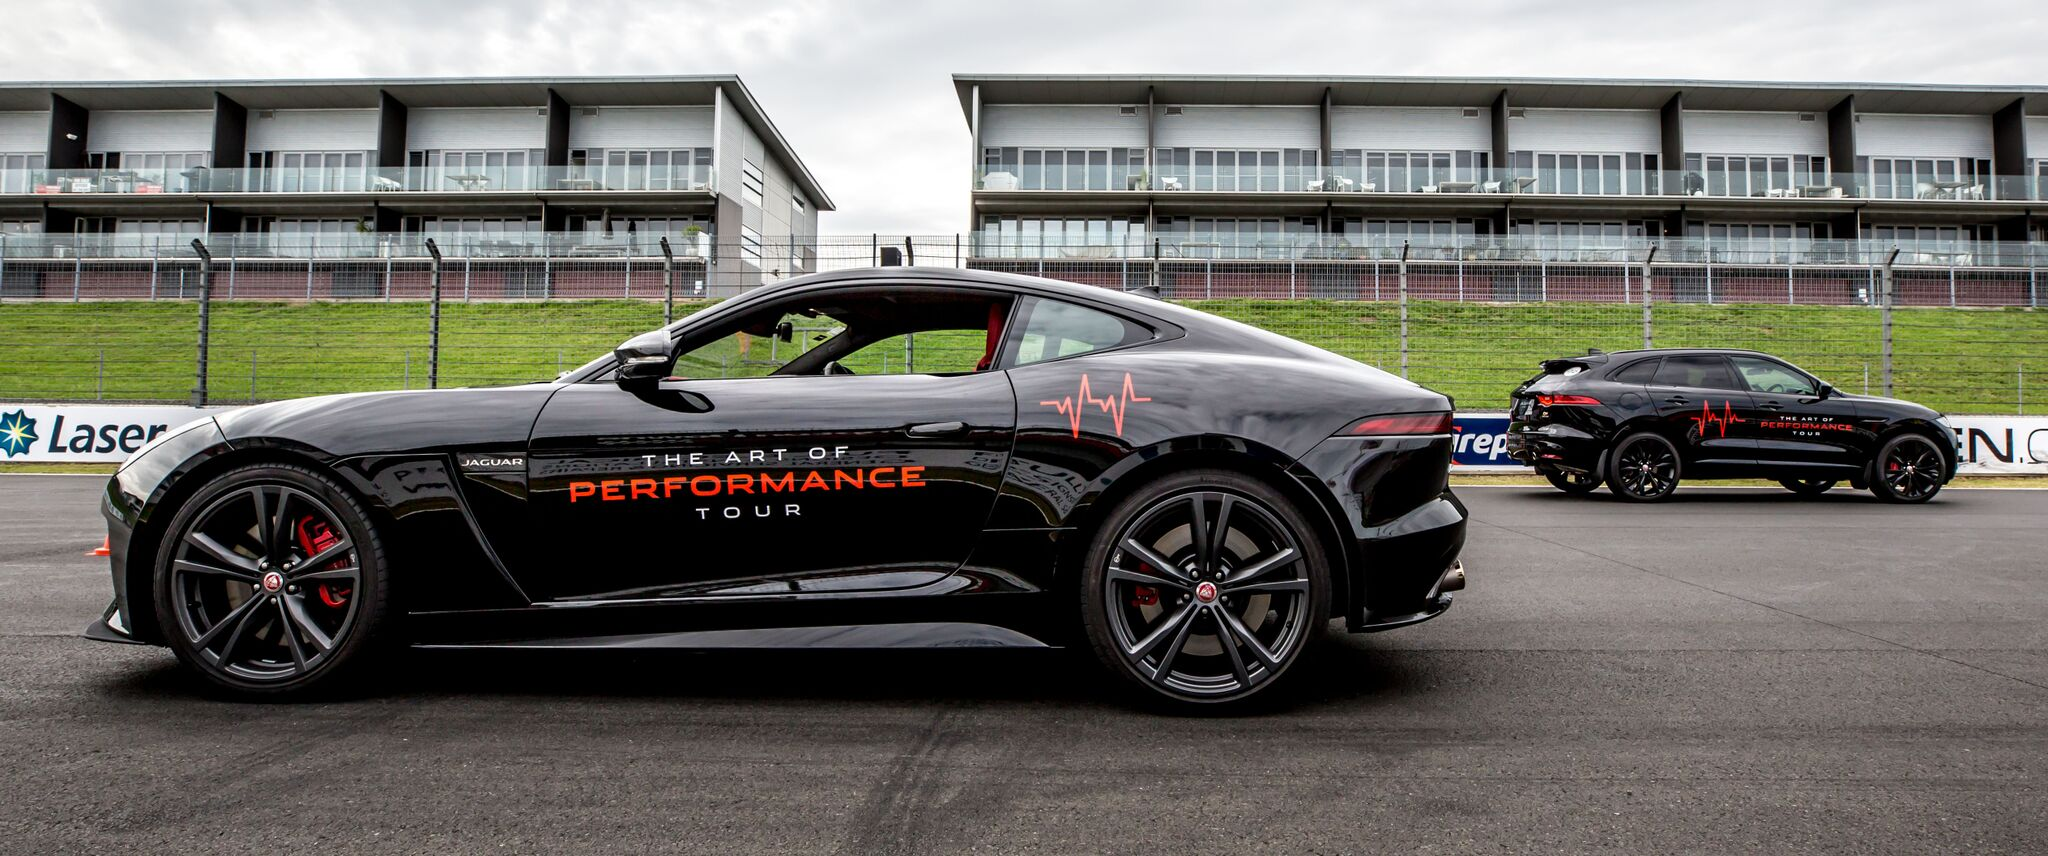 Jaguar - Art of Performance - THURS MORN  2MB-124_preview.jpeg